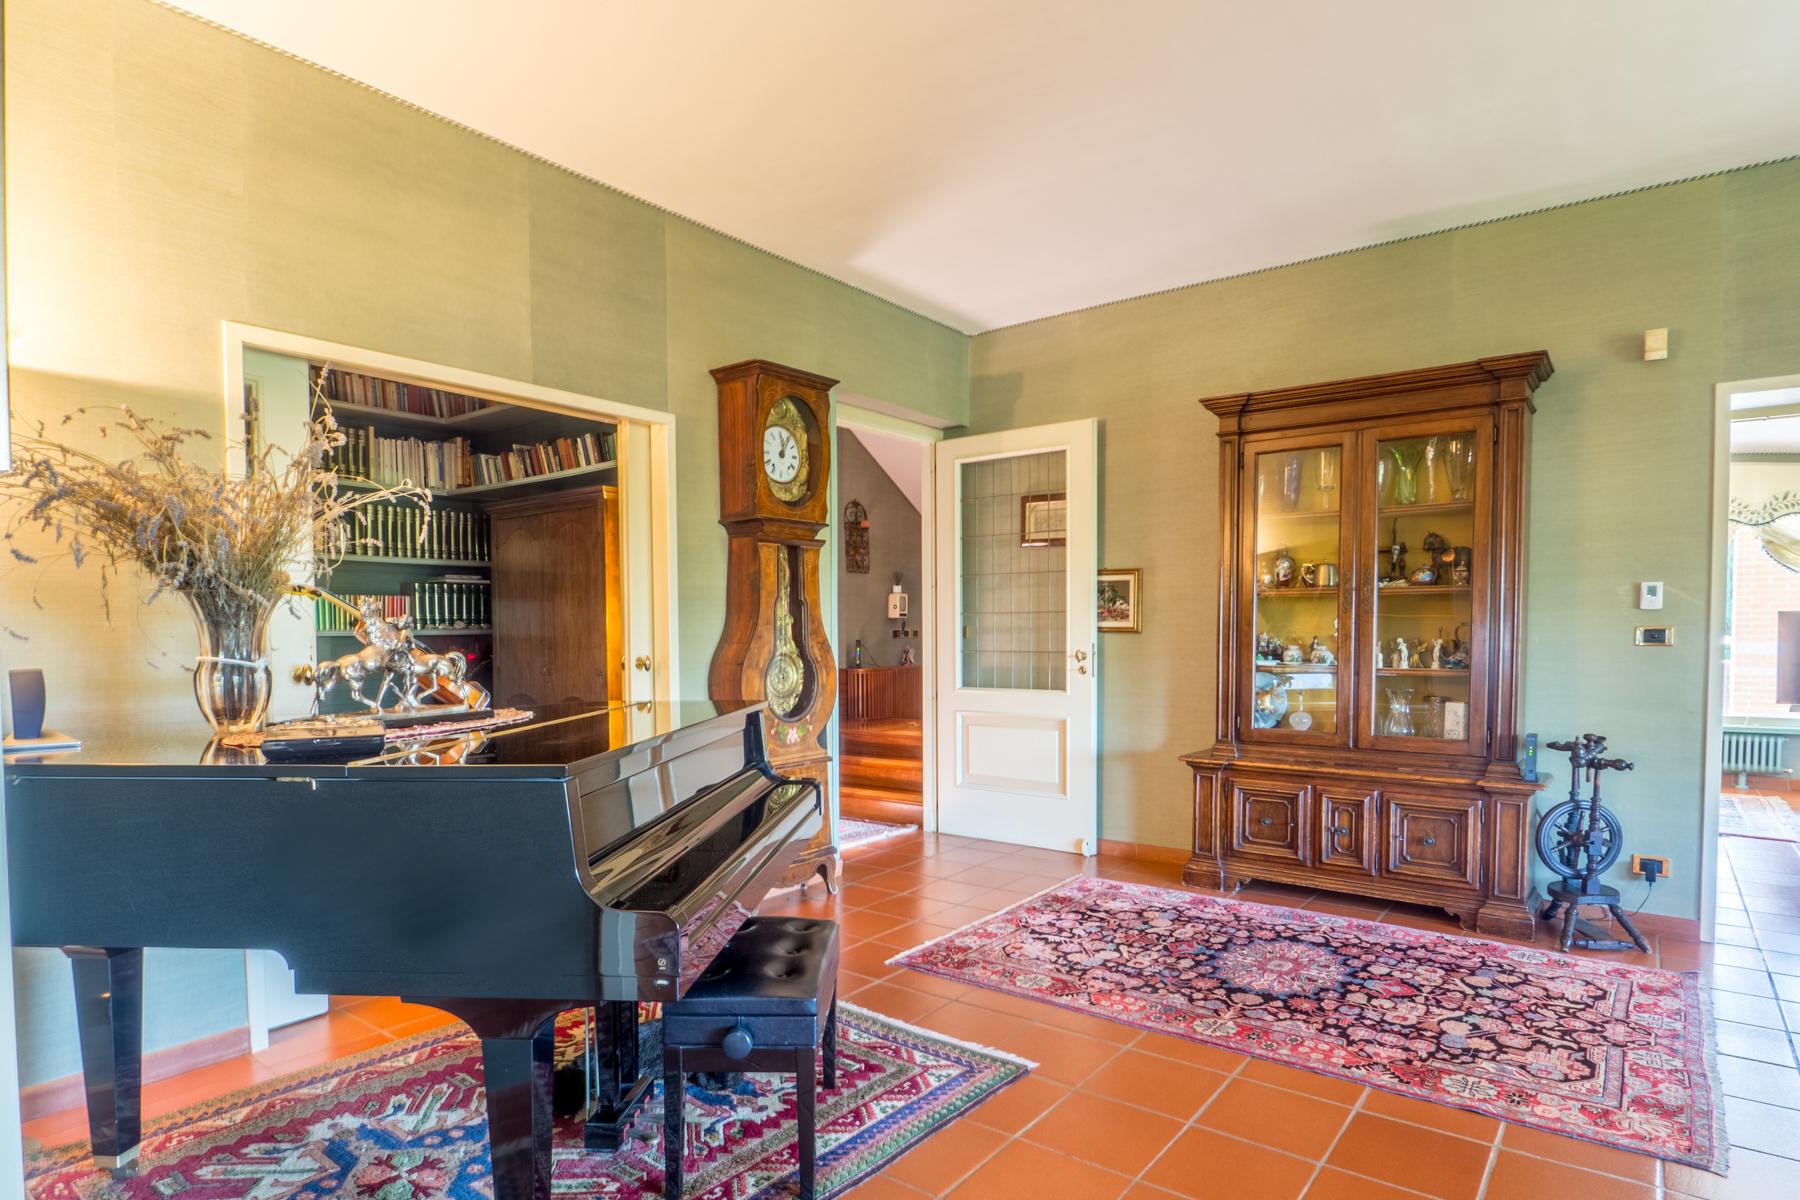 Villa in Vendita a Cantarana: 5 locali, 700 mq - Foto 12